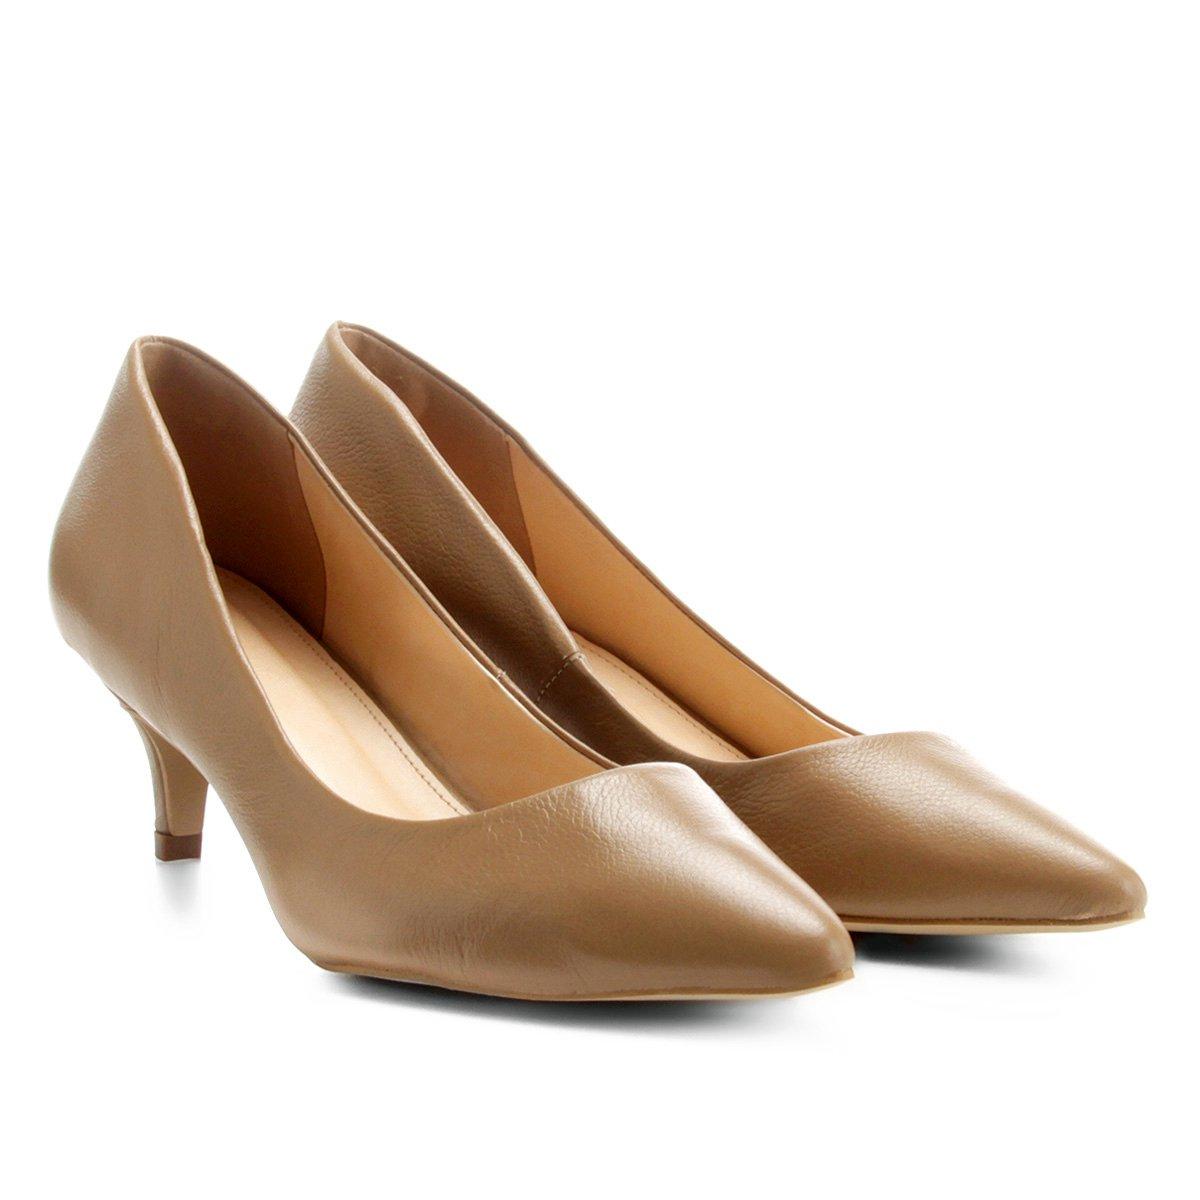 7fdb589223 Scarpin Couro Shoestock Salto Baixo - Bege